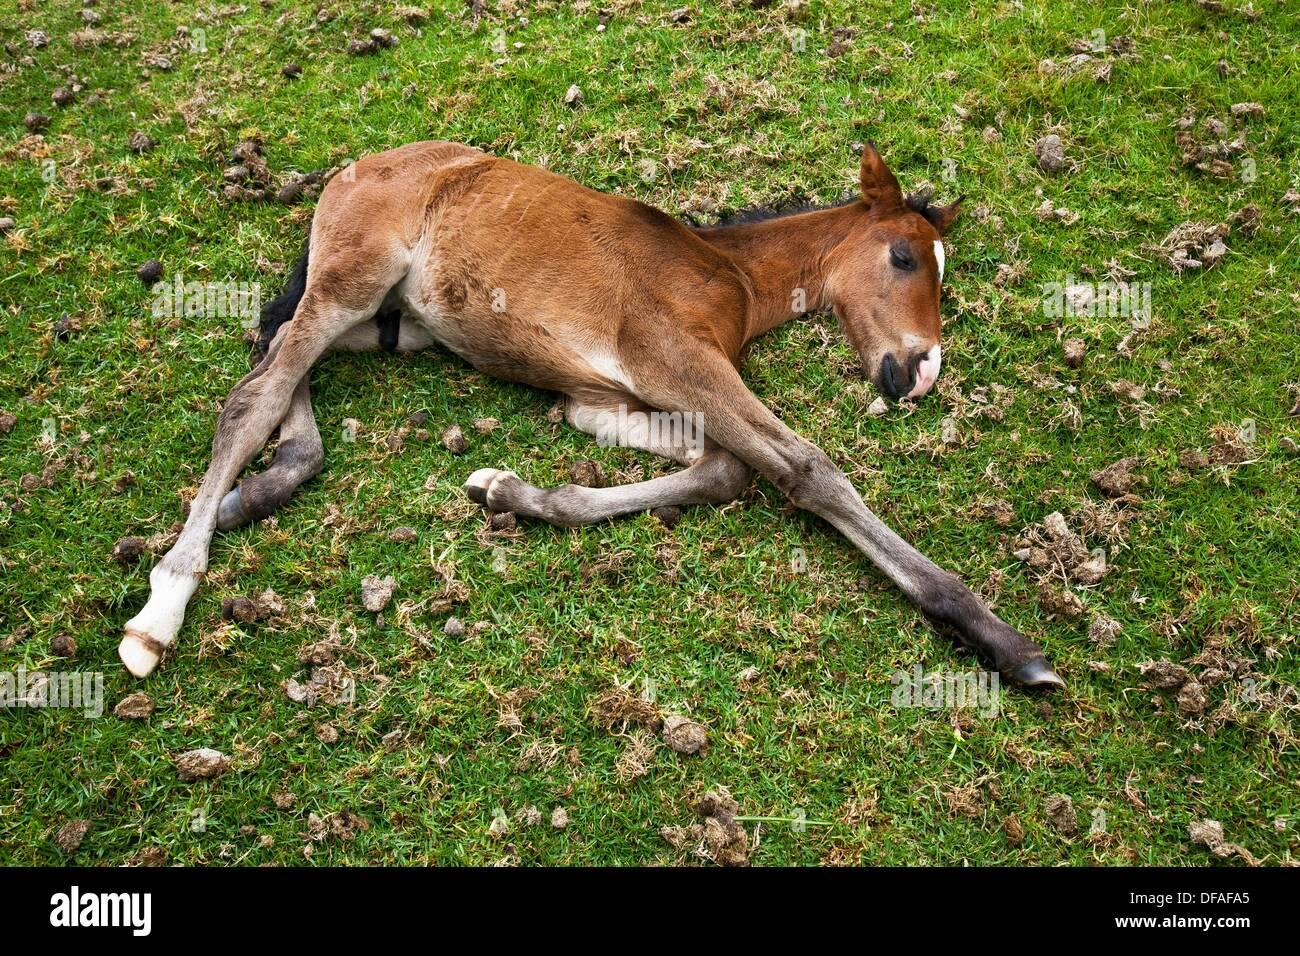 baby born horse instructions